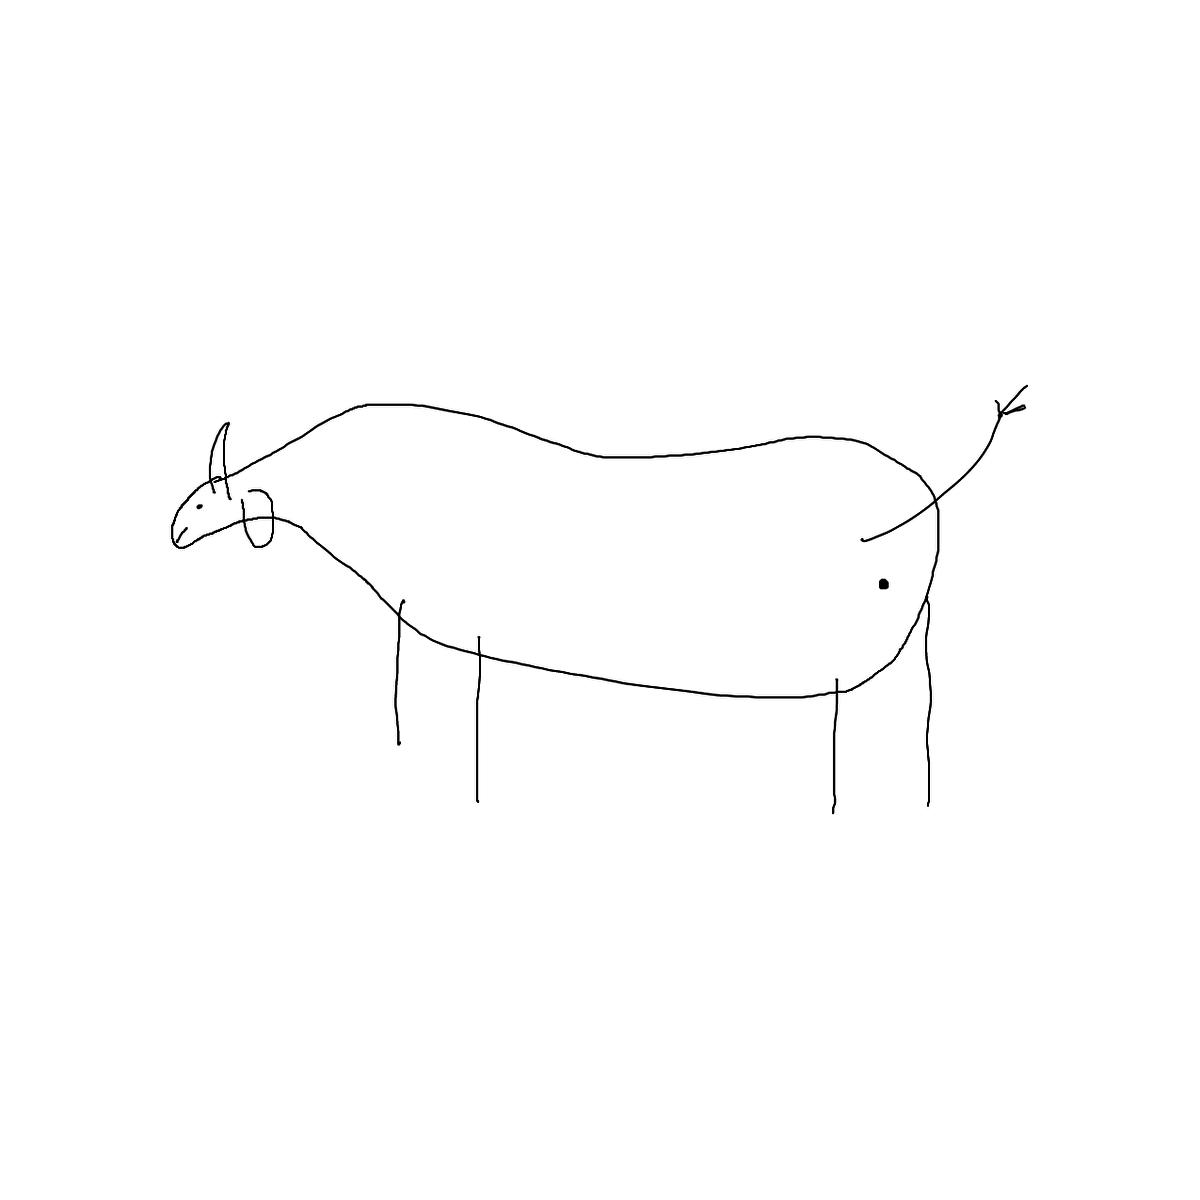 BAAAM drawing#2337 lat:52.4749984741210940lng: 13.4069375991821290